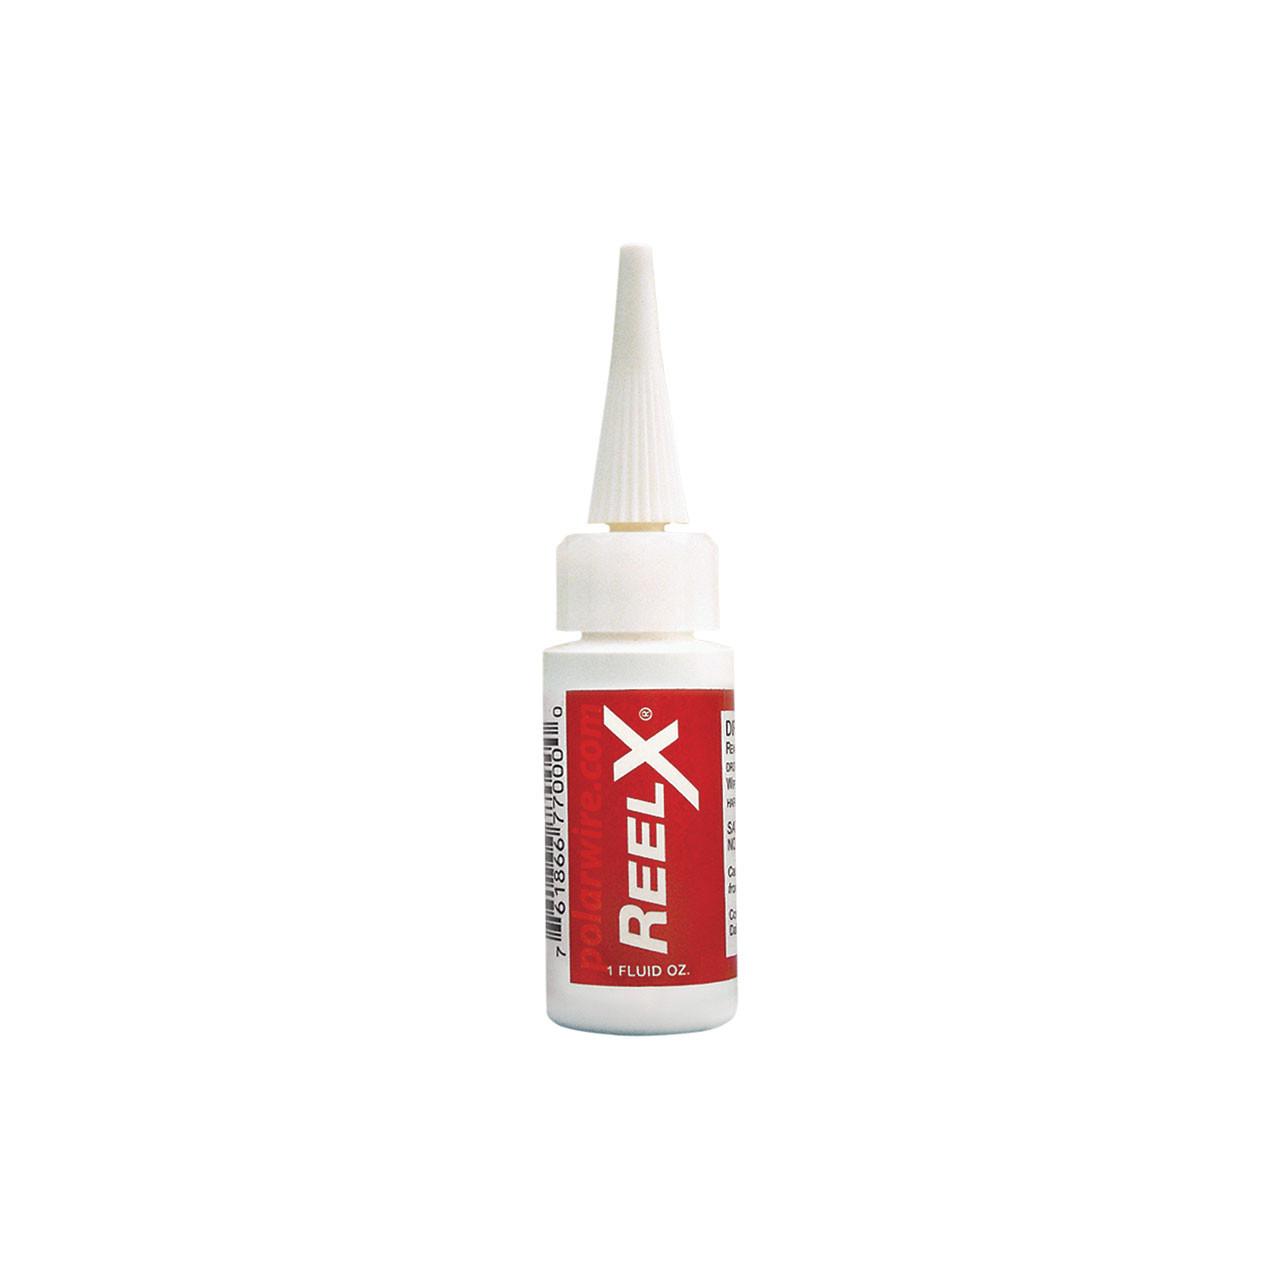 CORROSION X REELX 1 OZ